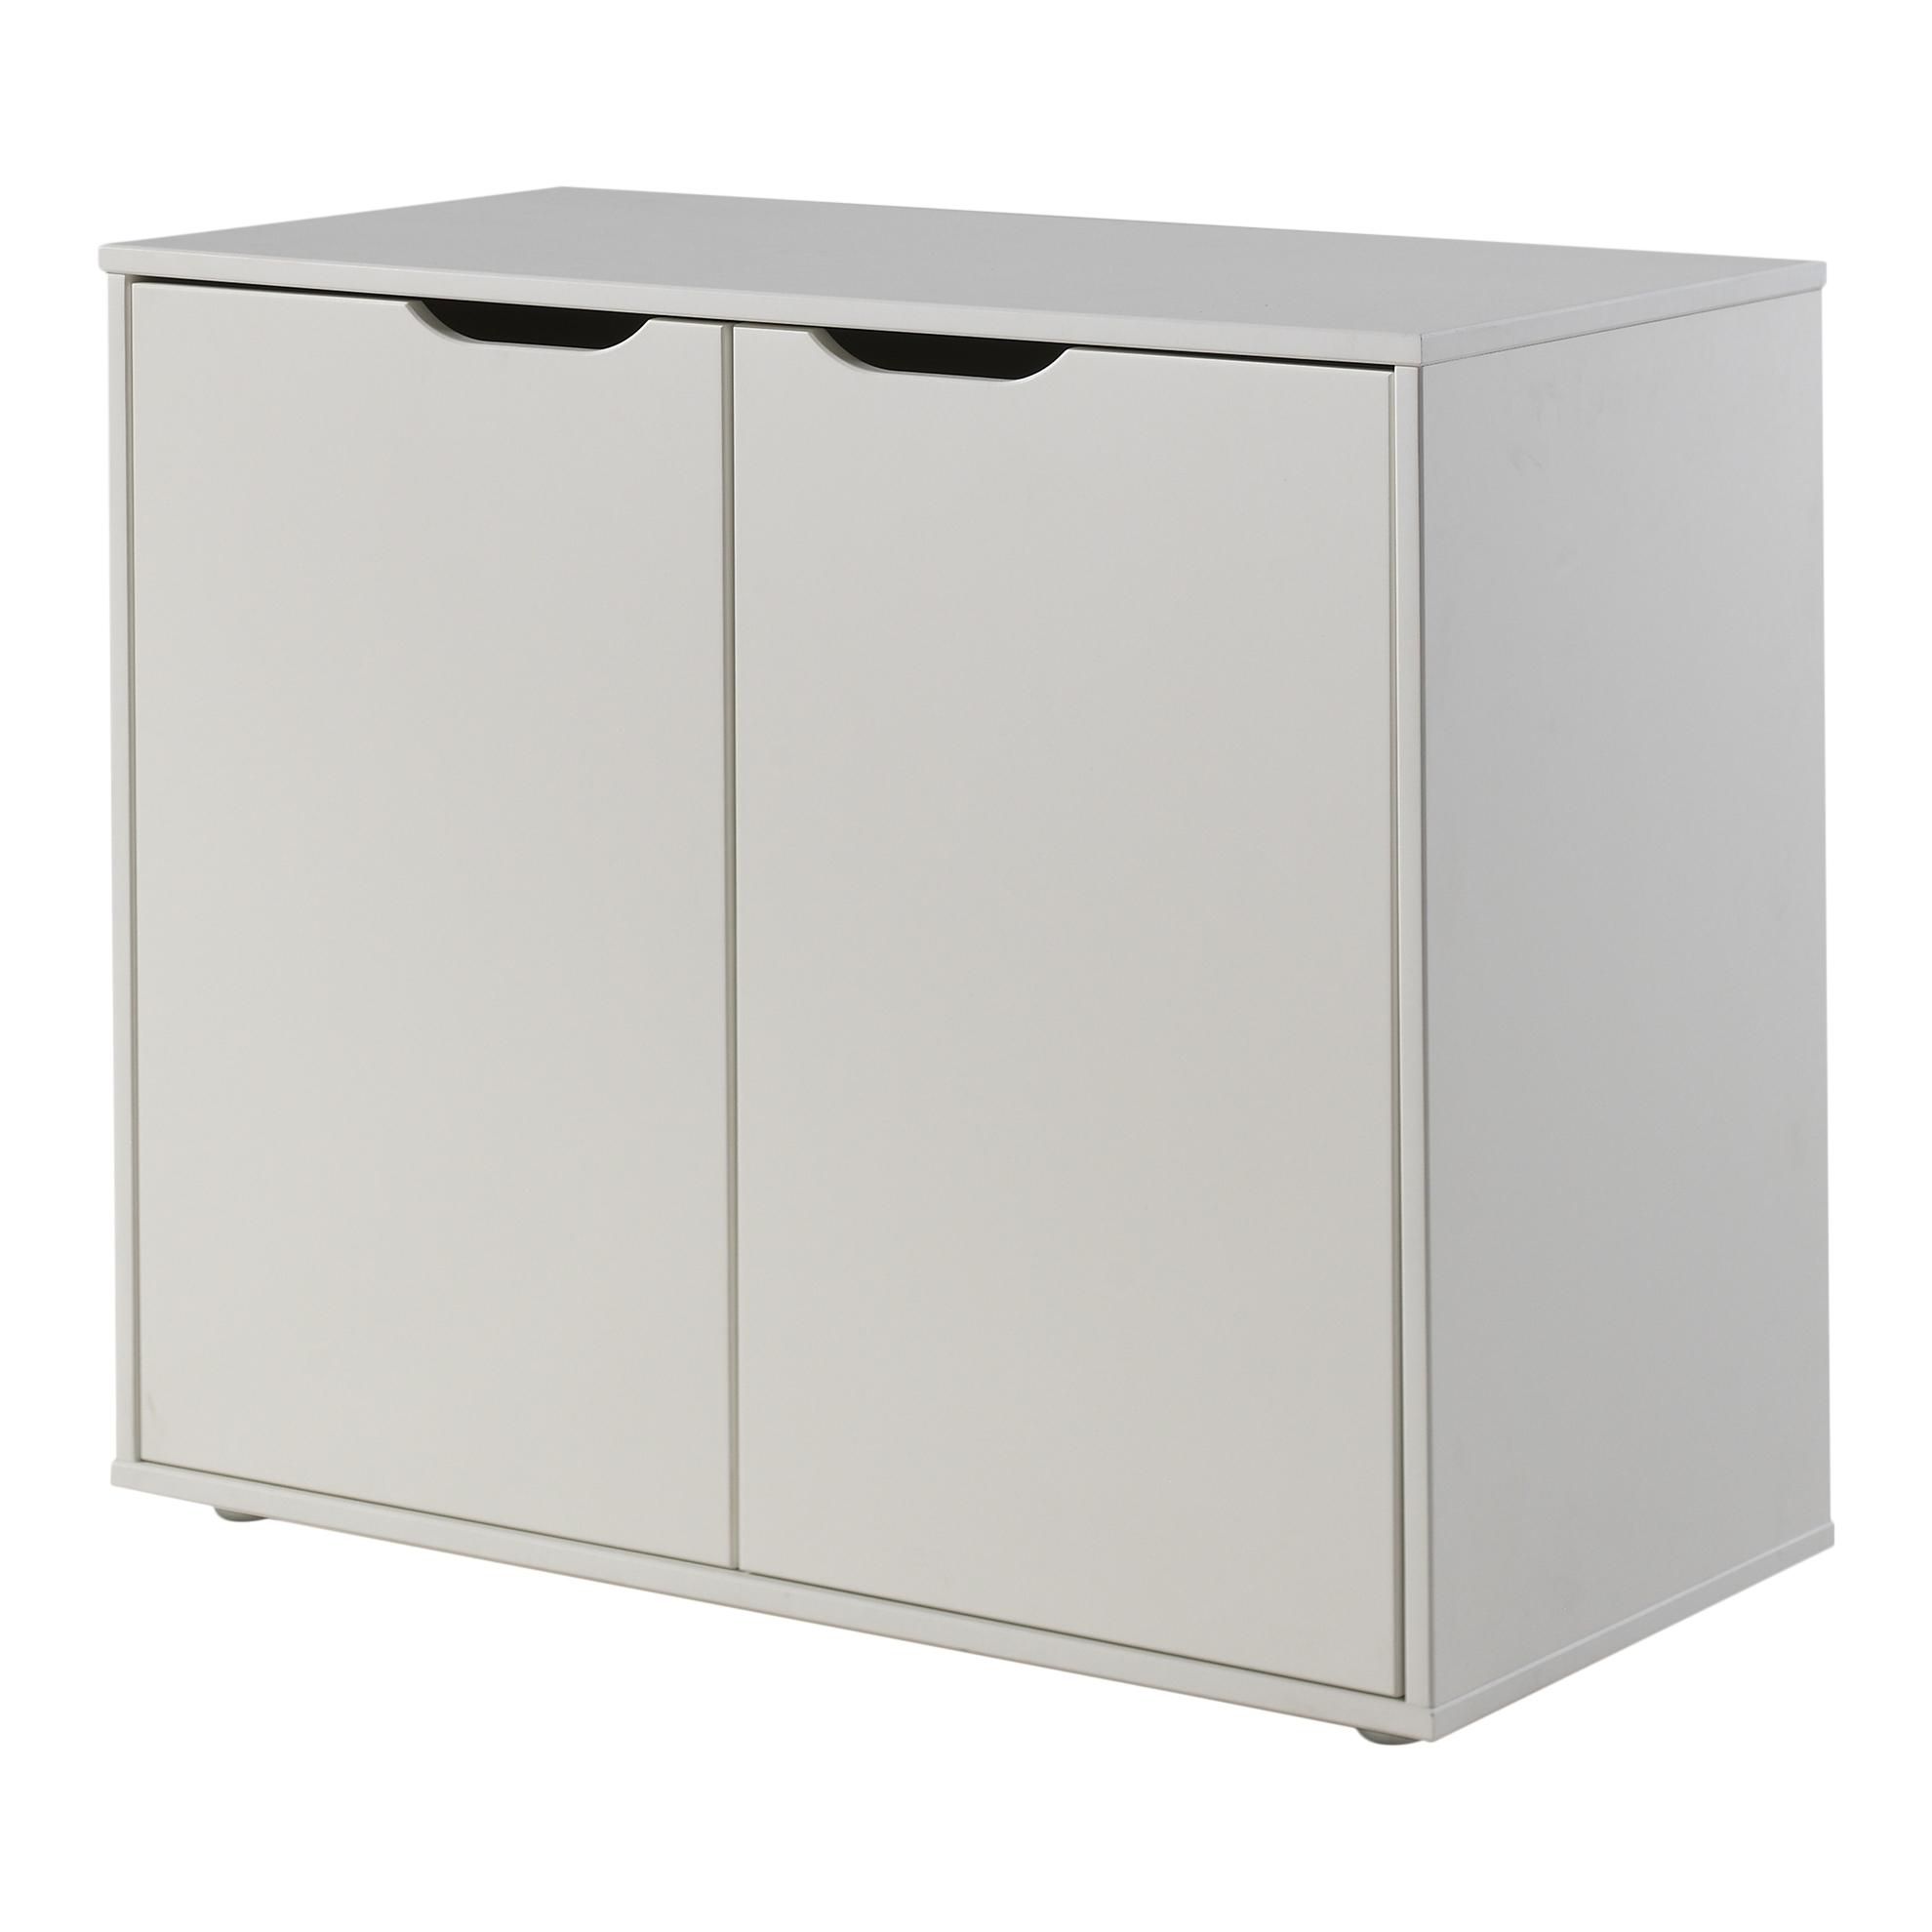 Cabinet din MDF cu 2 usi, pentru copii Pino Alb, l85,5xA43,3xH71,8 cm somproduct.ro